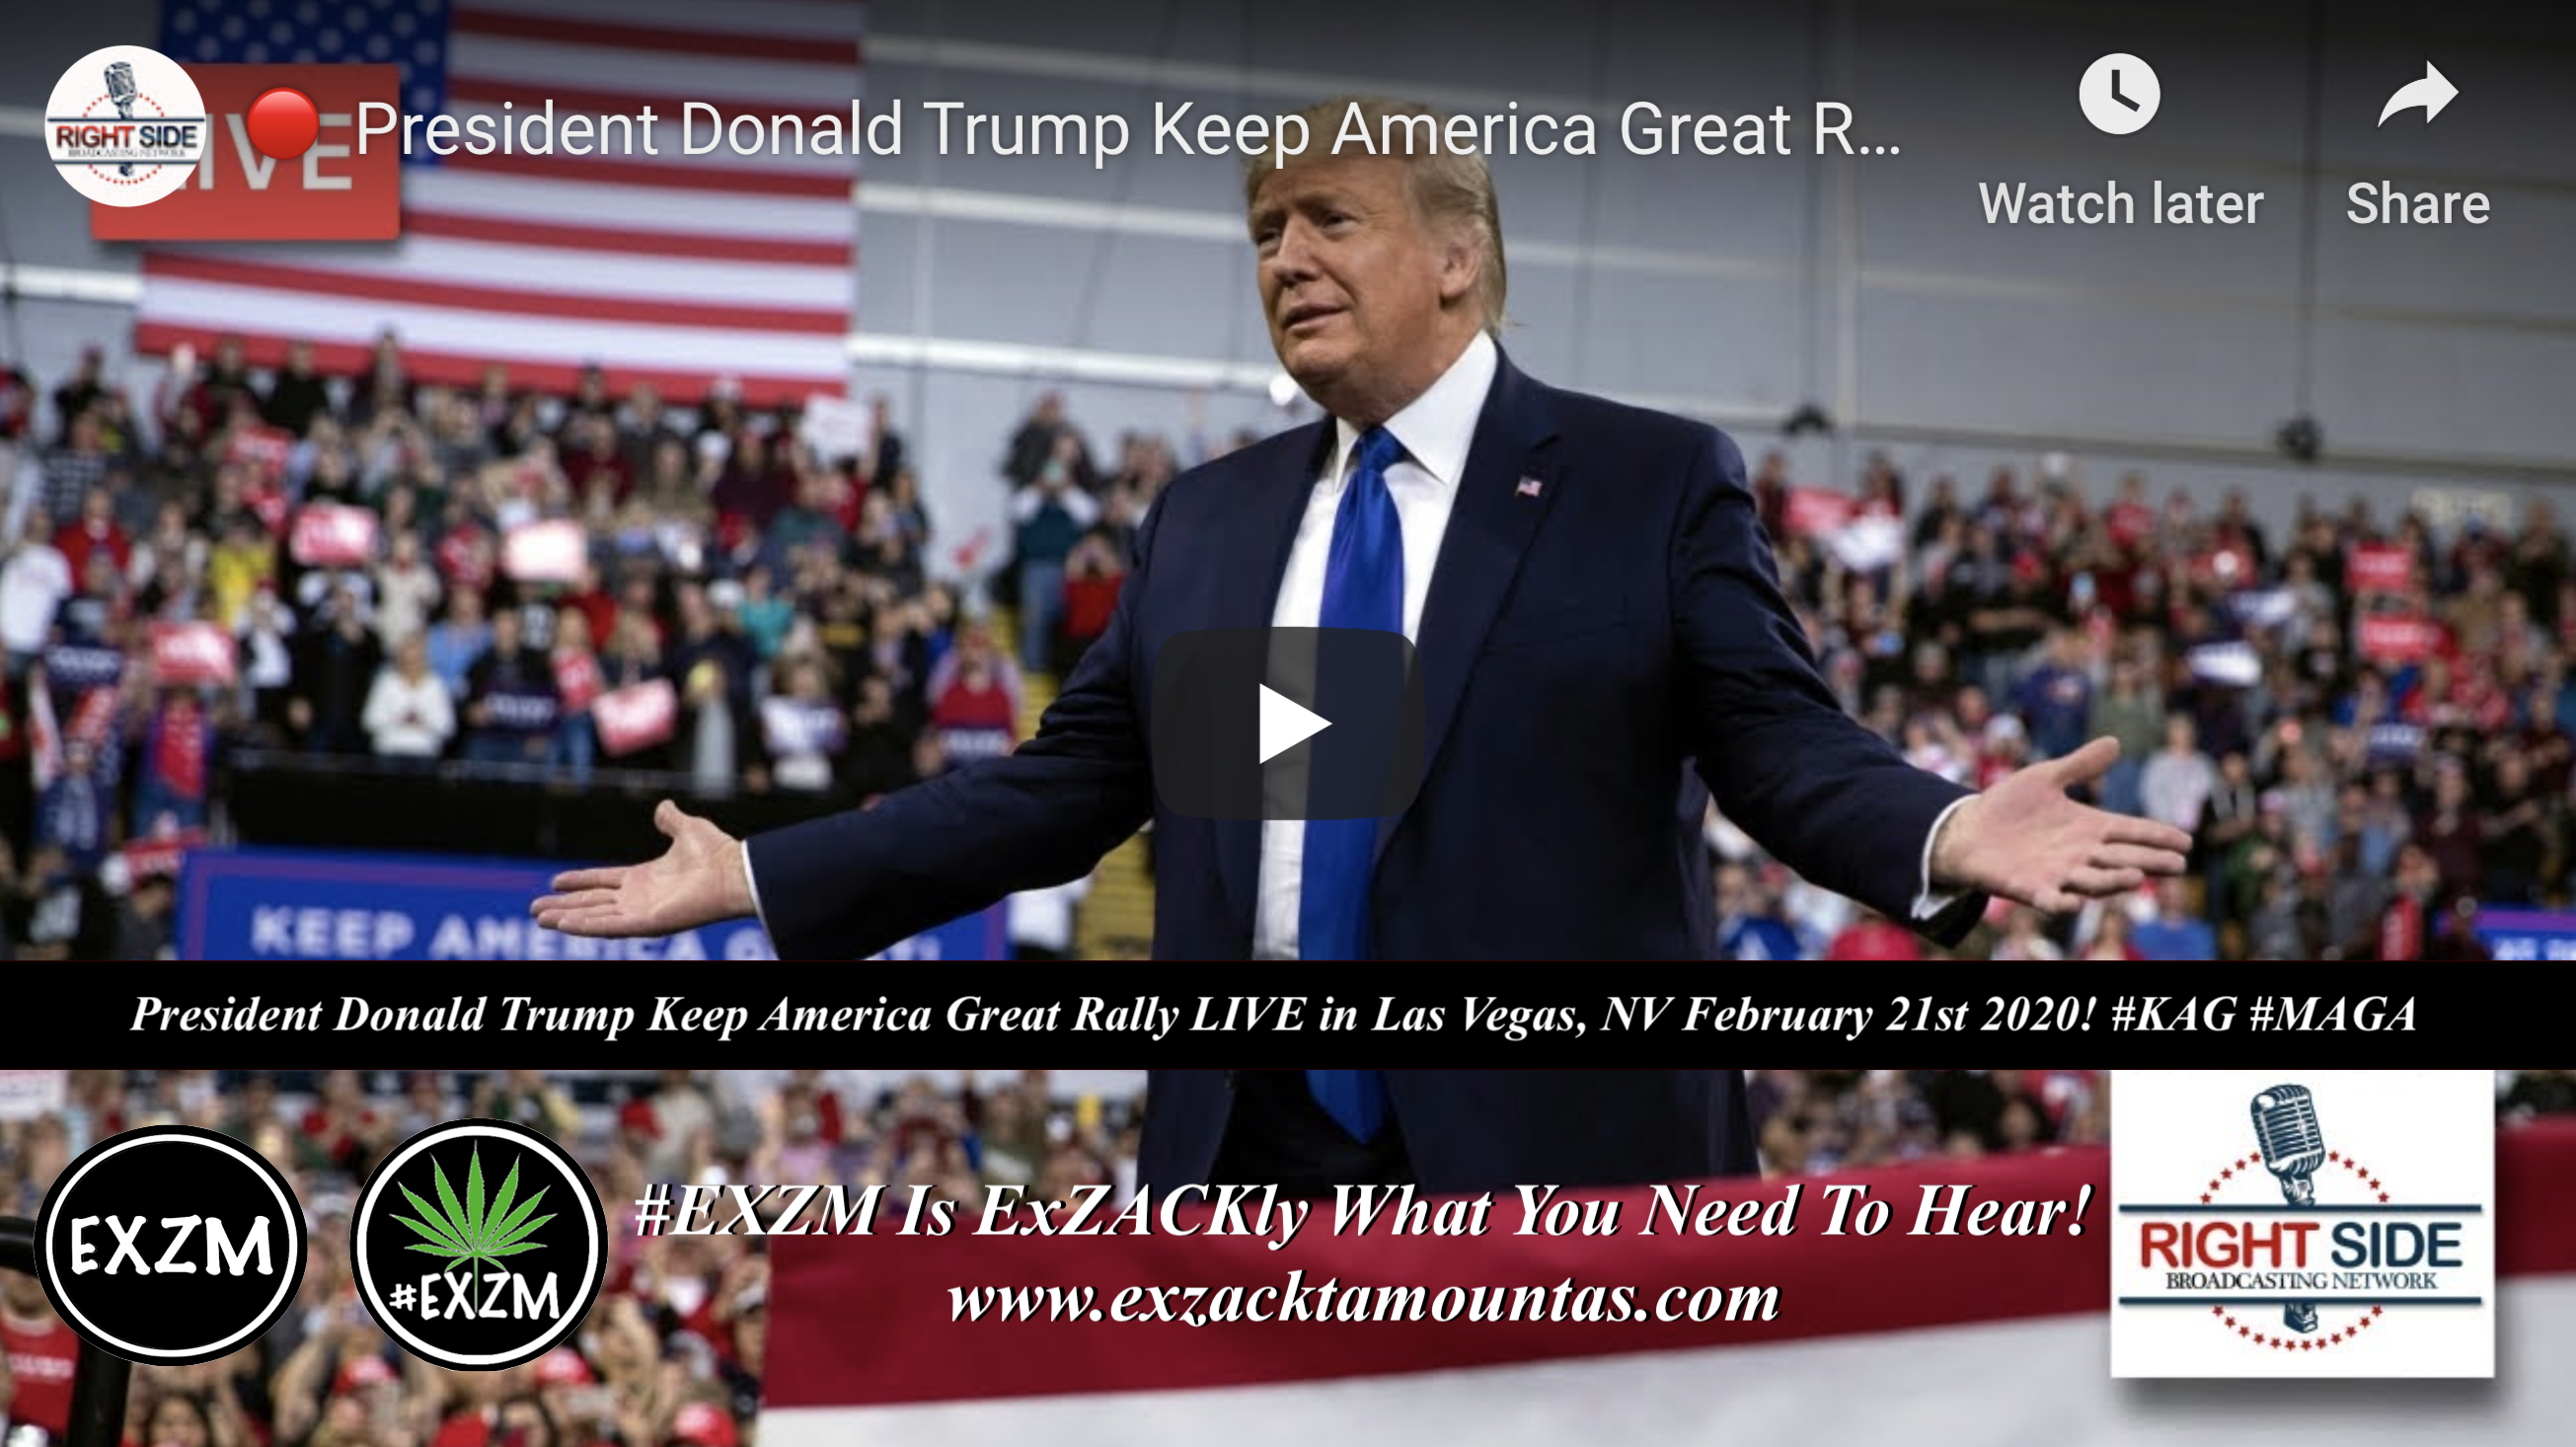 Donald Trump KAG MAGA Las Vegas, NV 2 21 2020